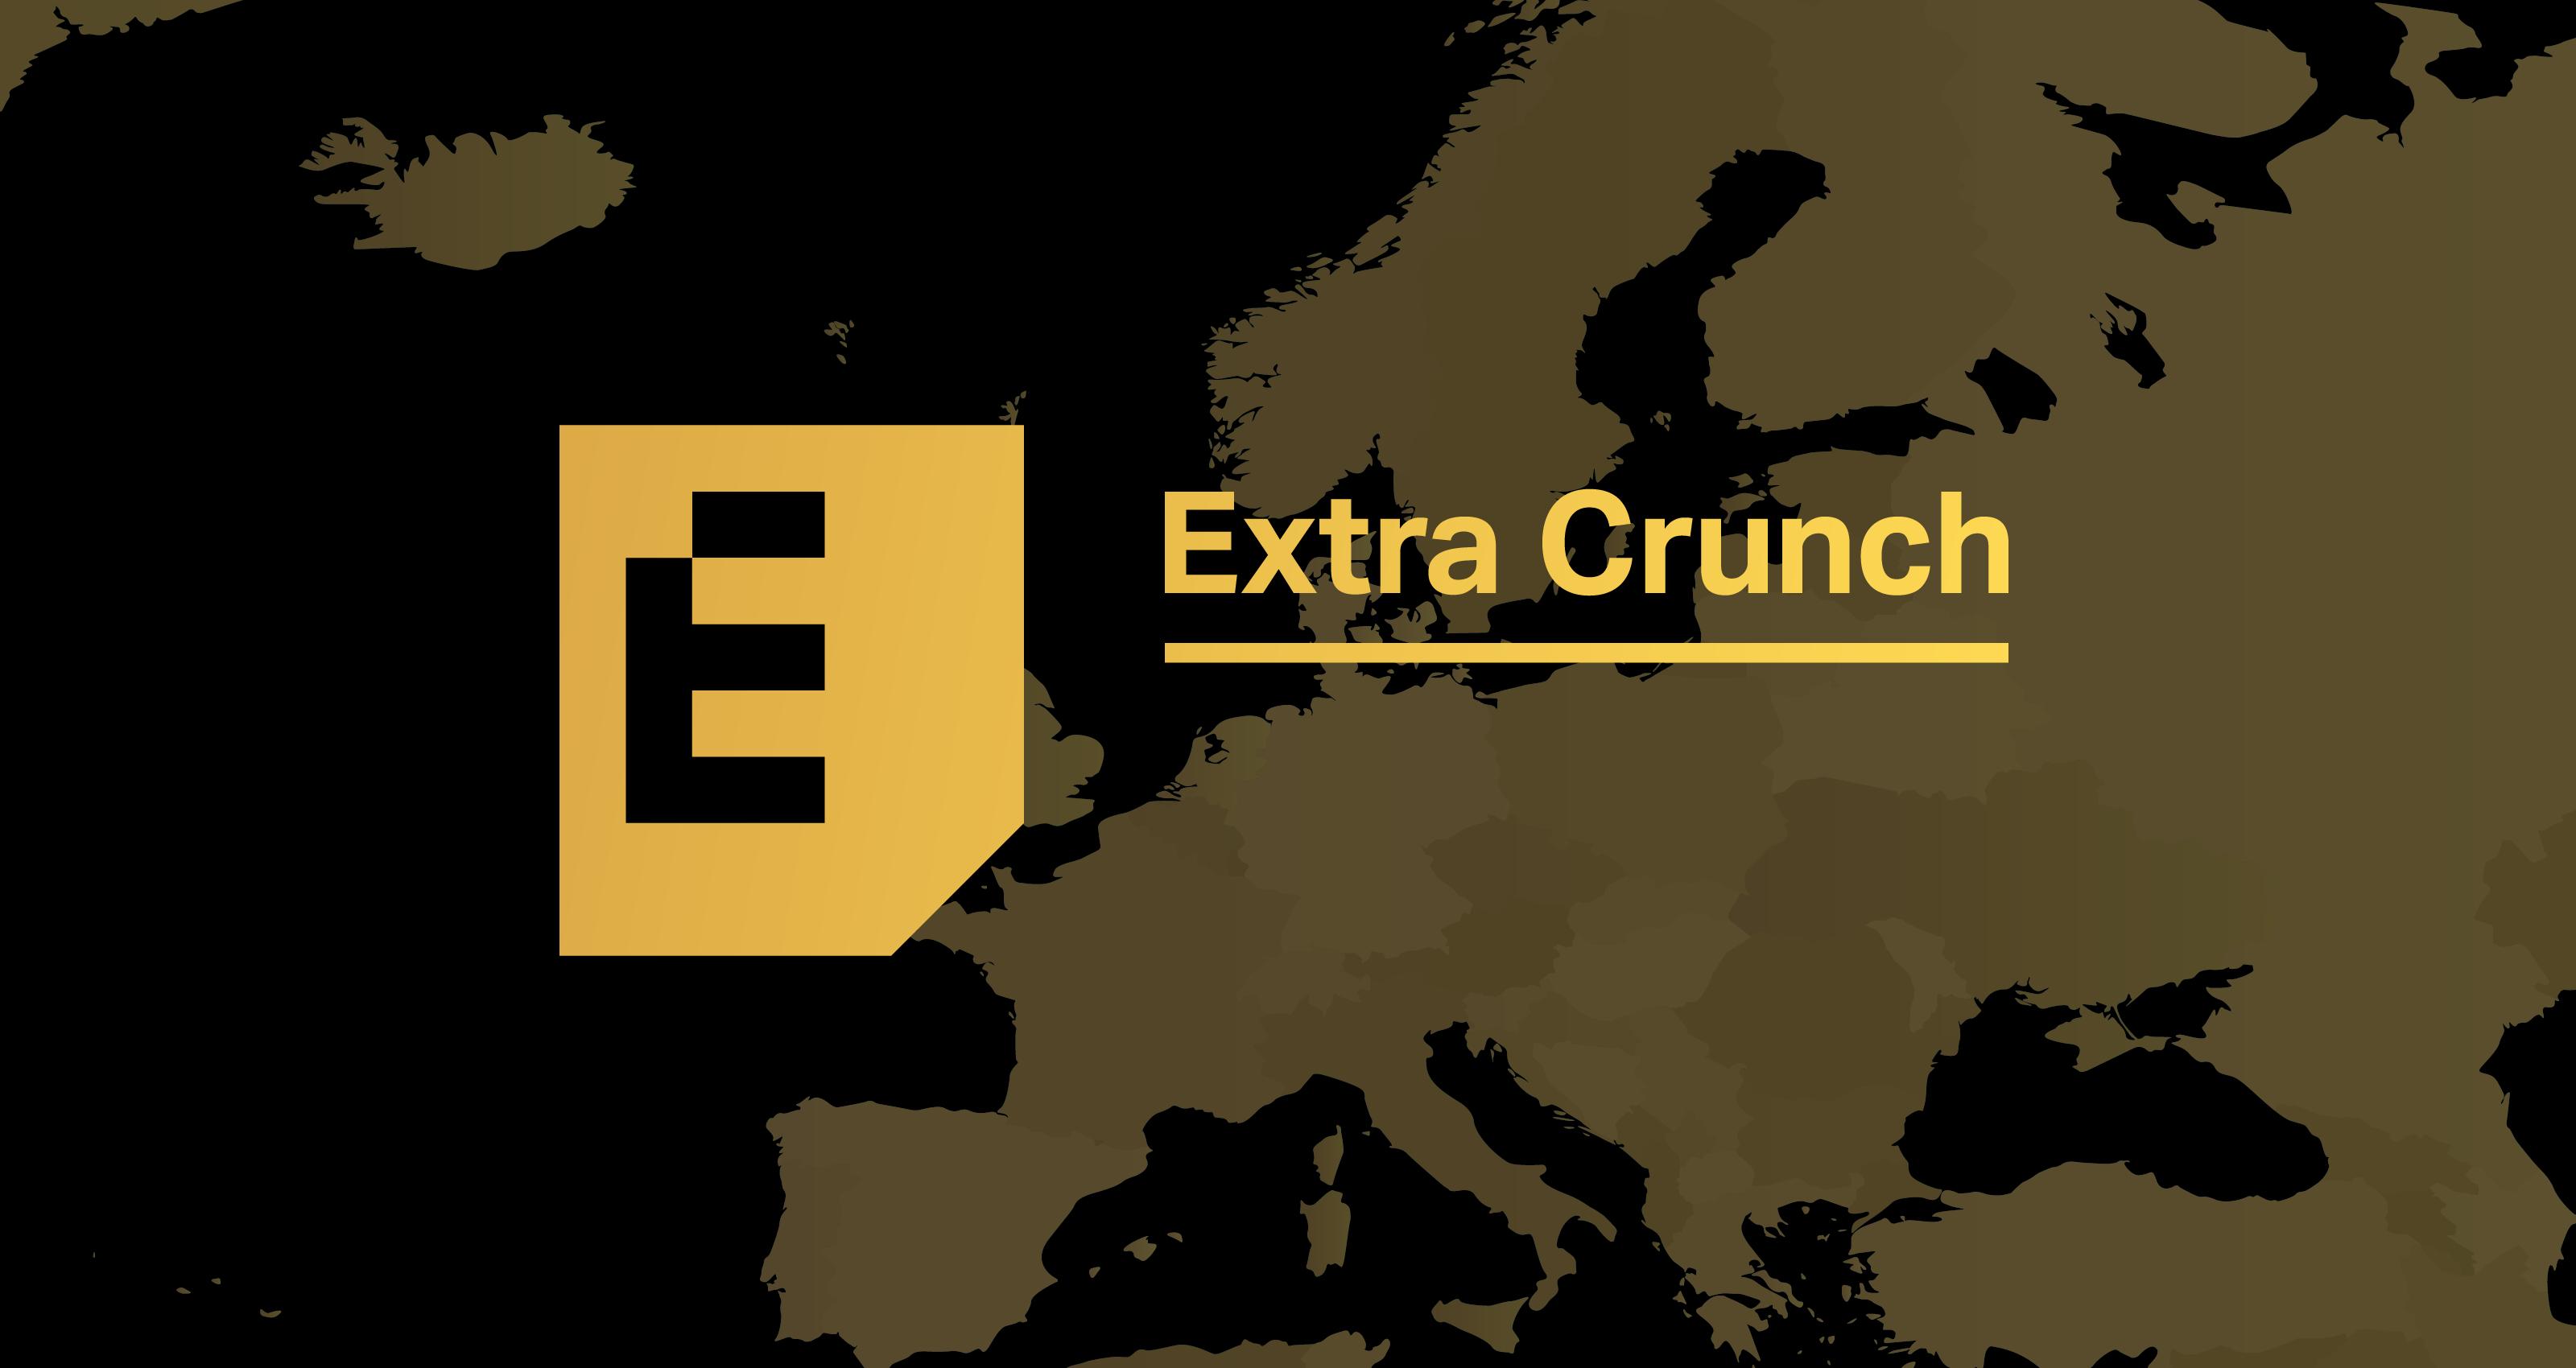 https://techcrunch.com/wp-content/uploads/2019/10/extra-crunch-europe.png